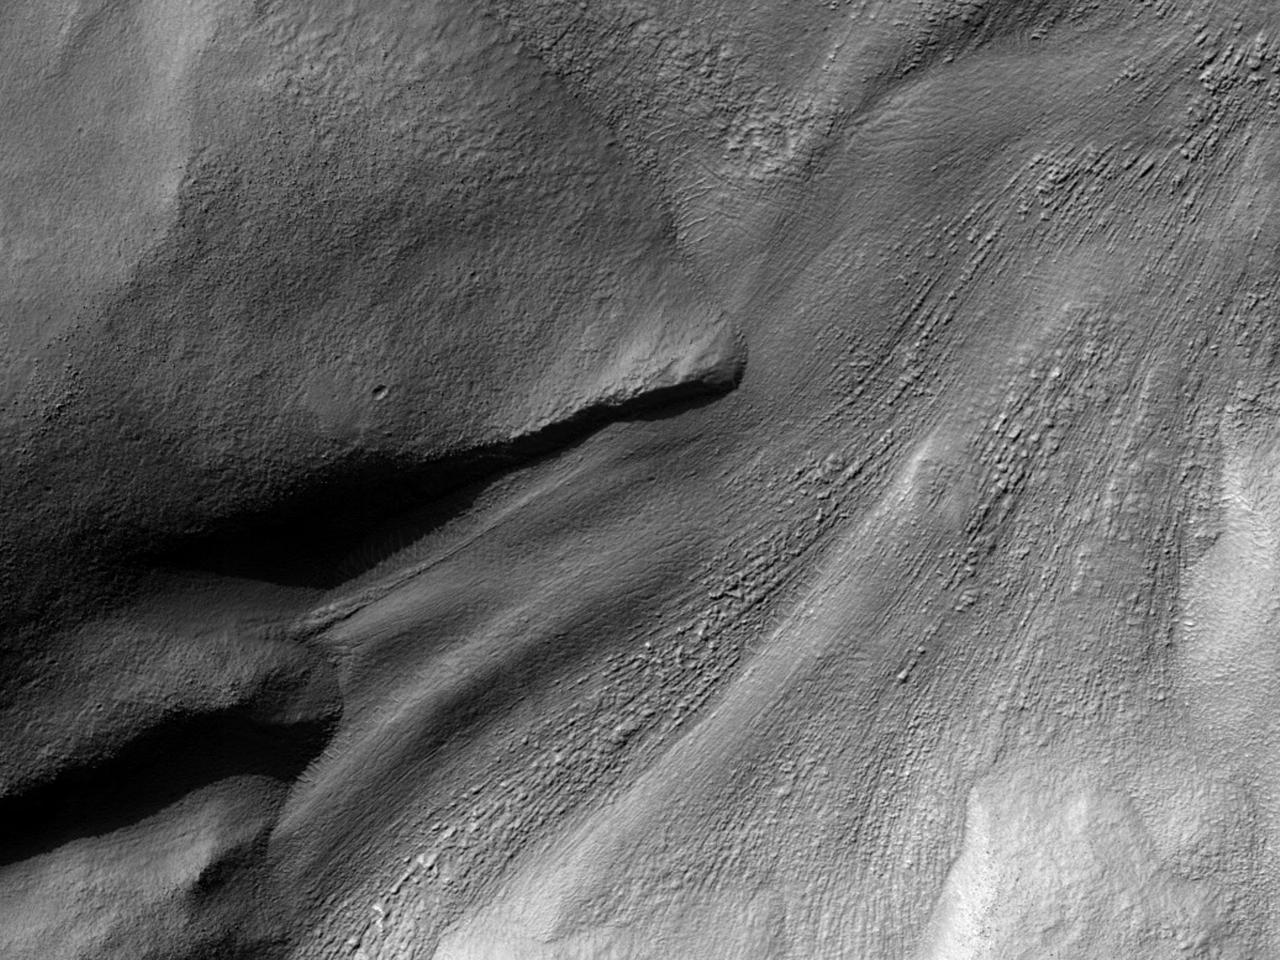 تدفق قريب من وادى راول (Reull Vallis)